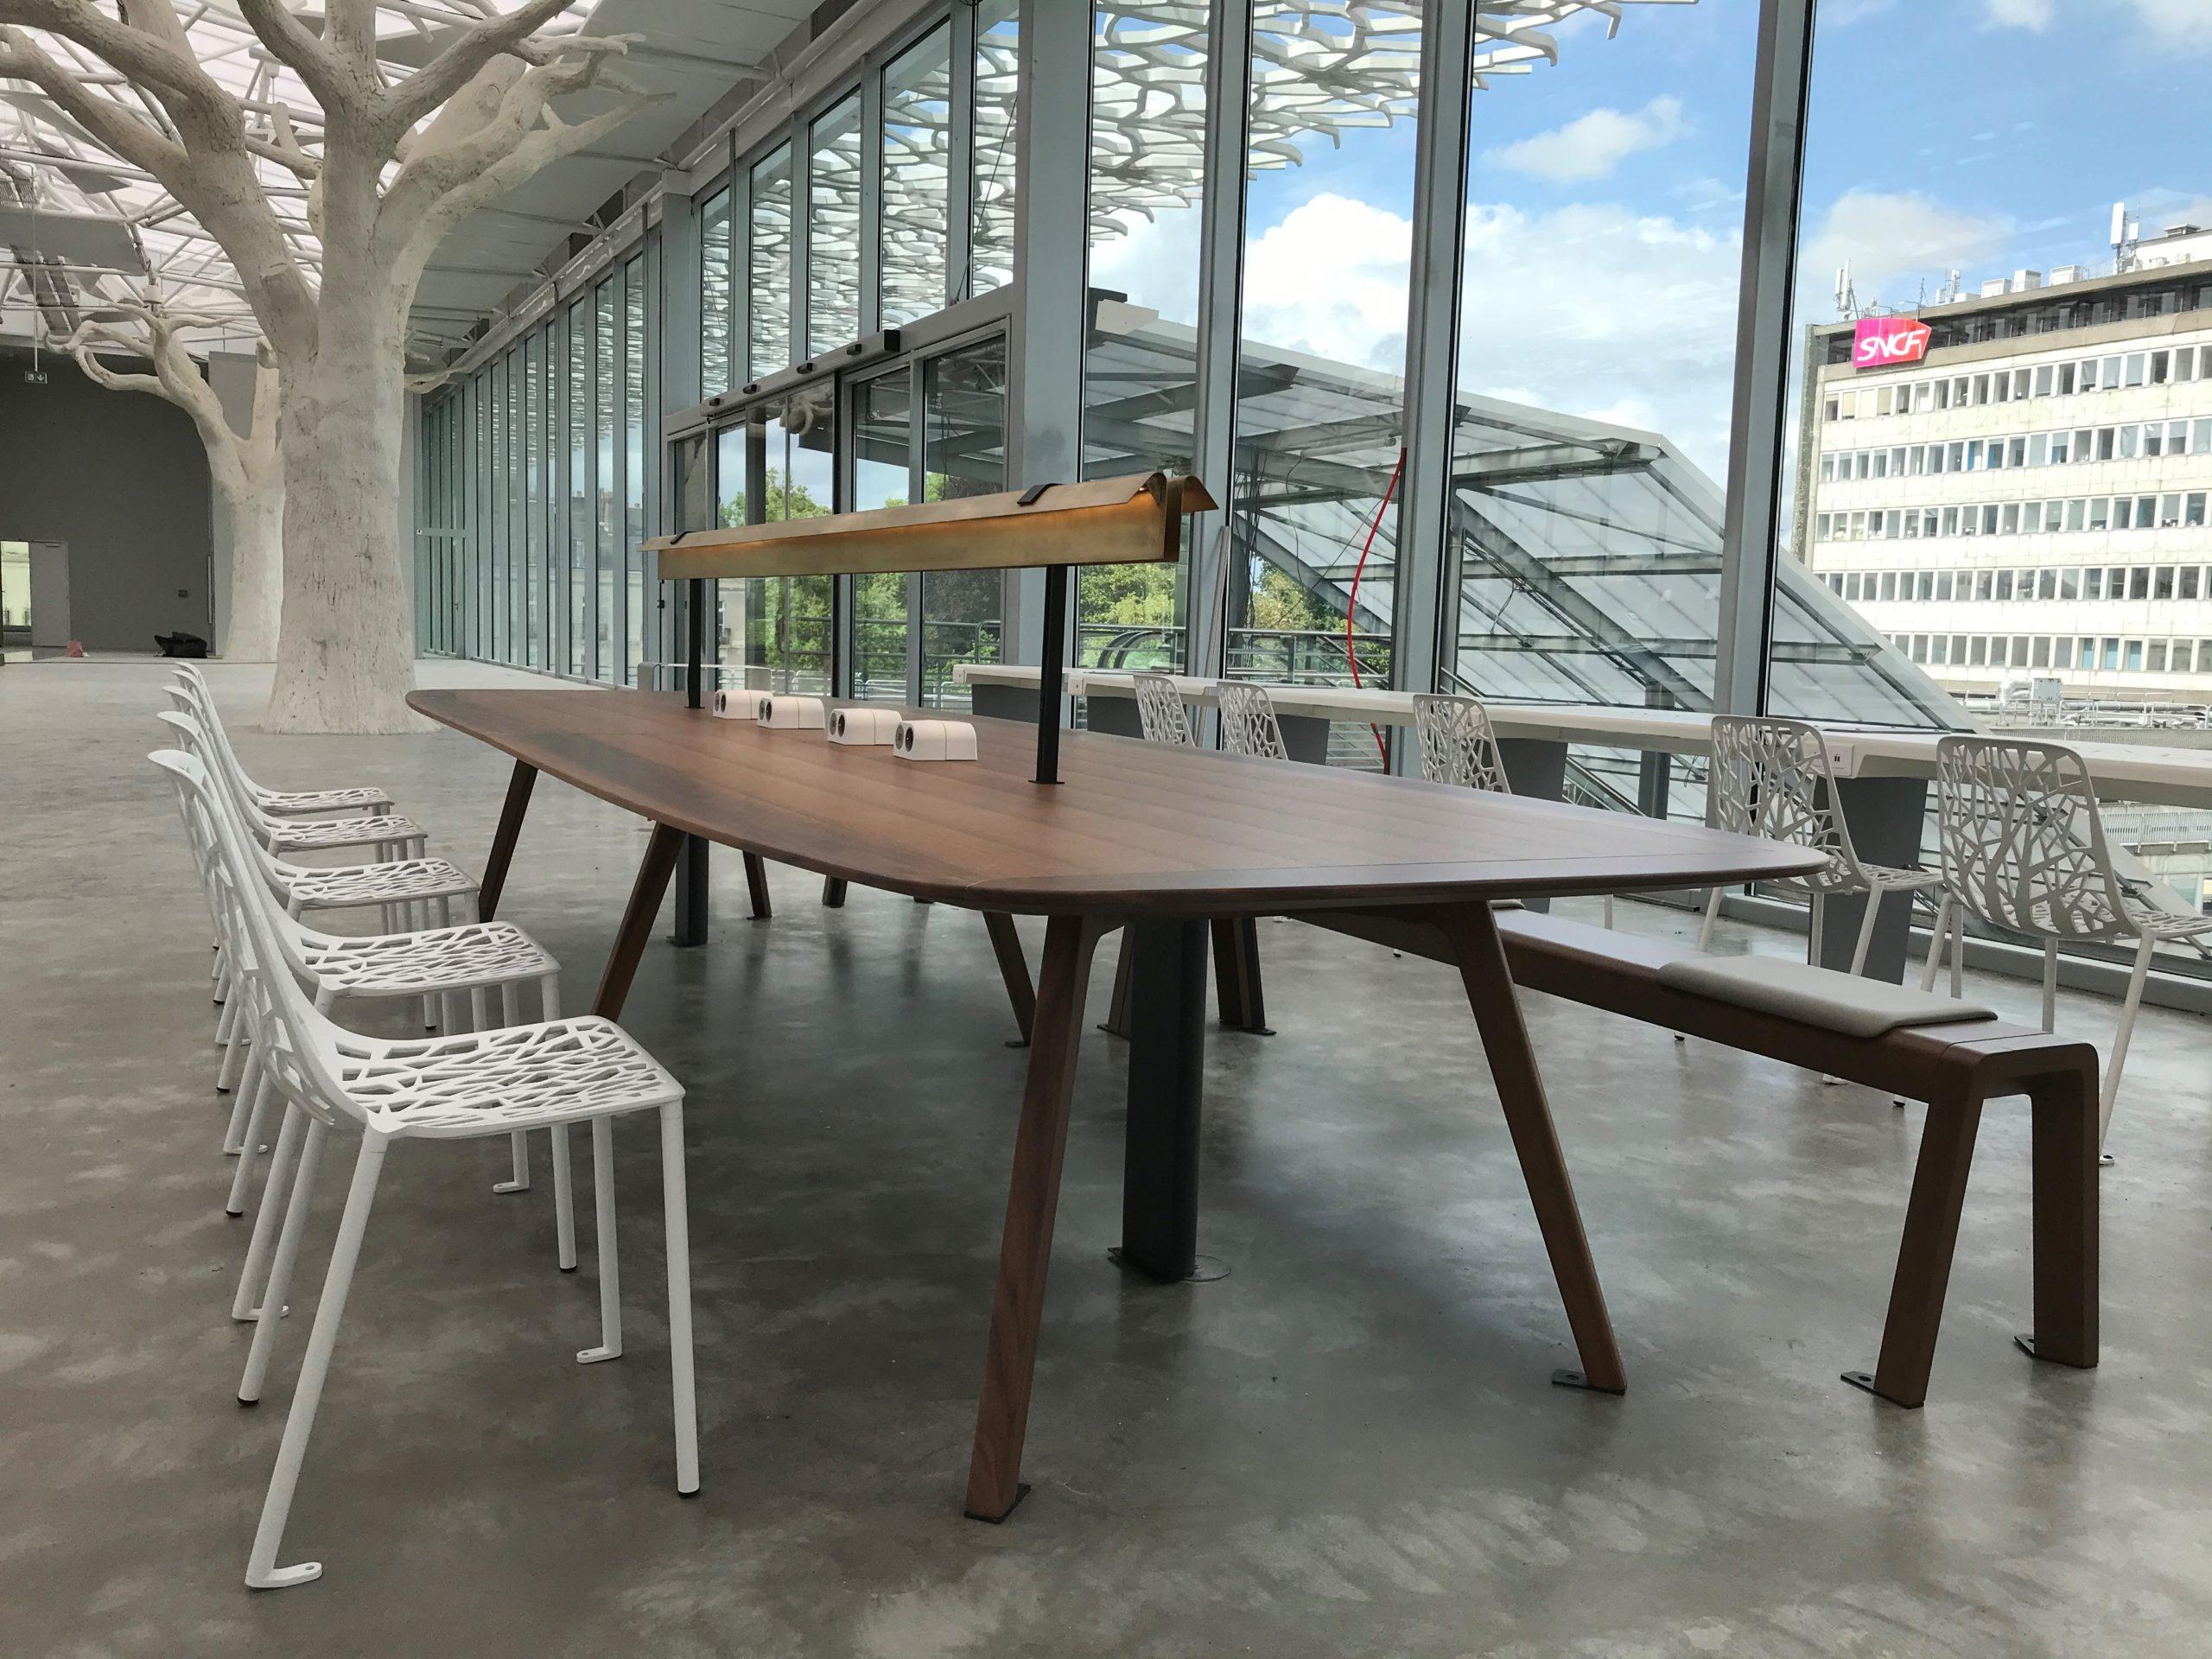 salon avec 2 arbres - gare sncf nantes passerelle - presta france - solutions agencement